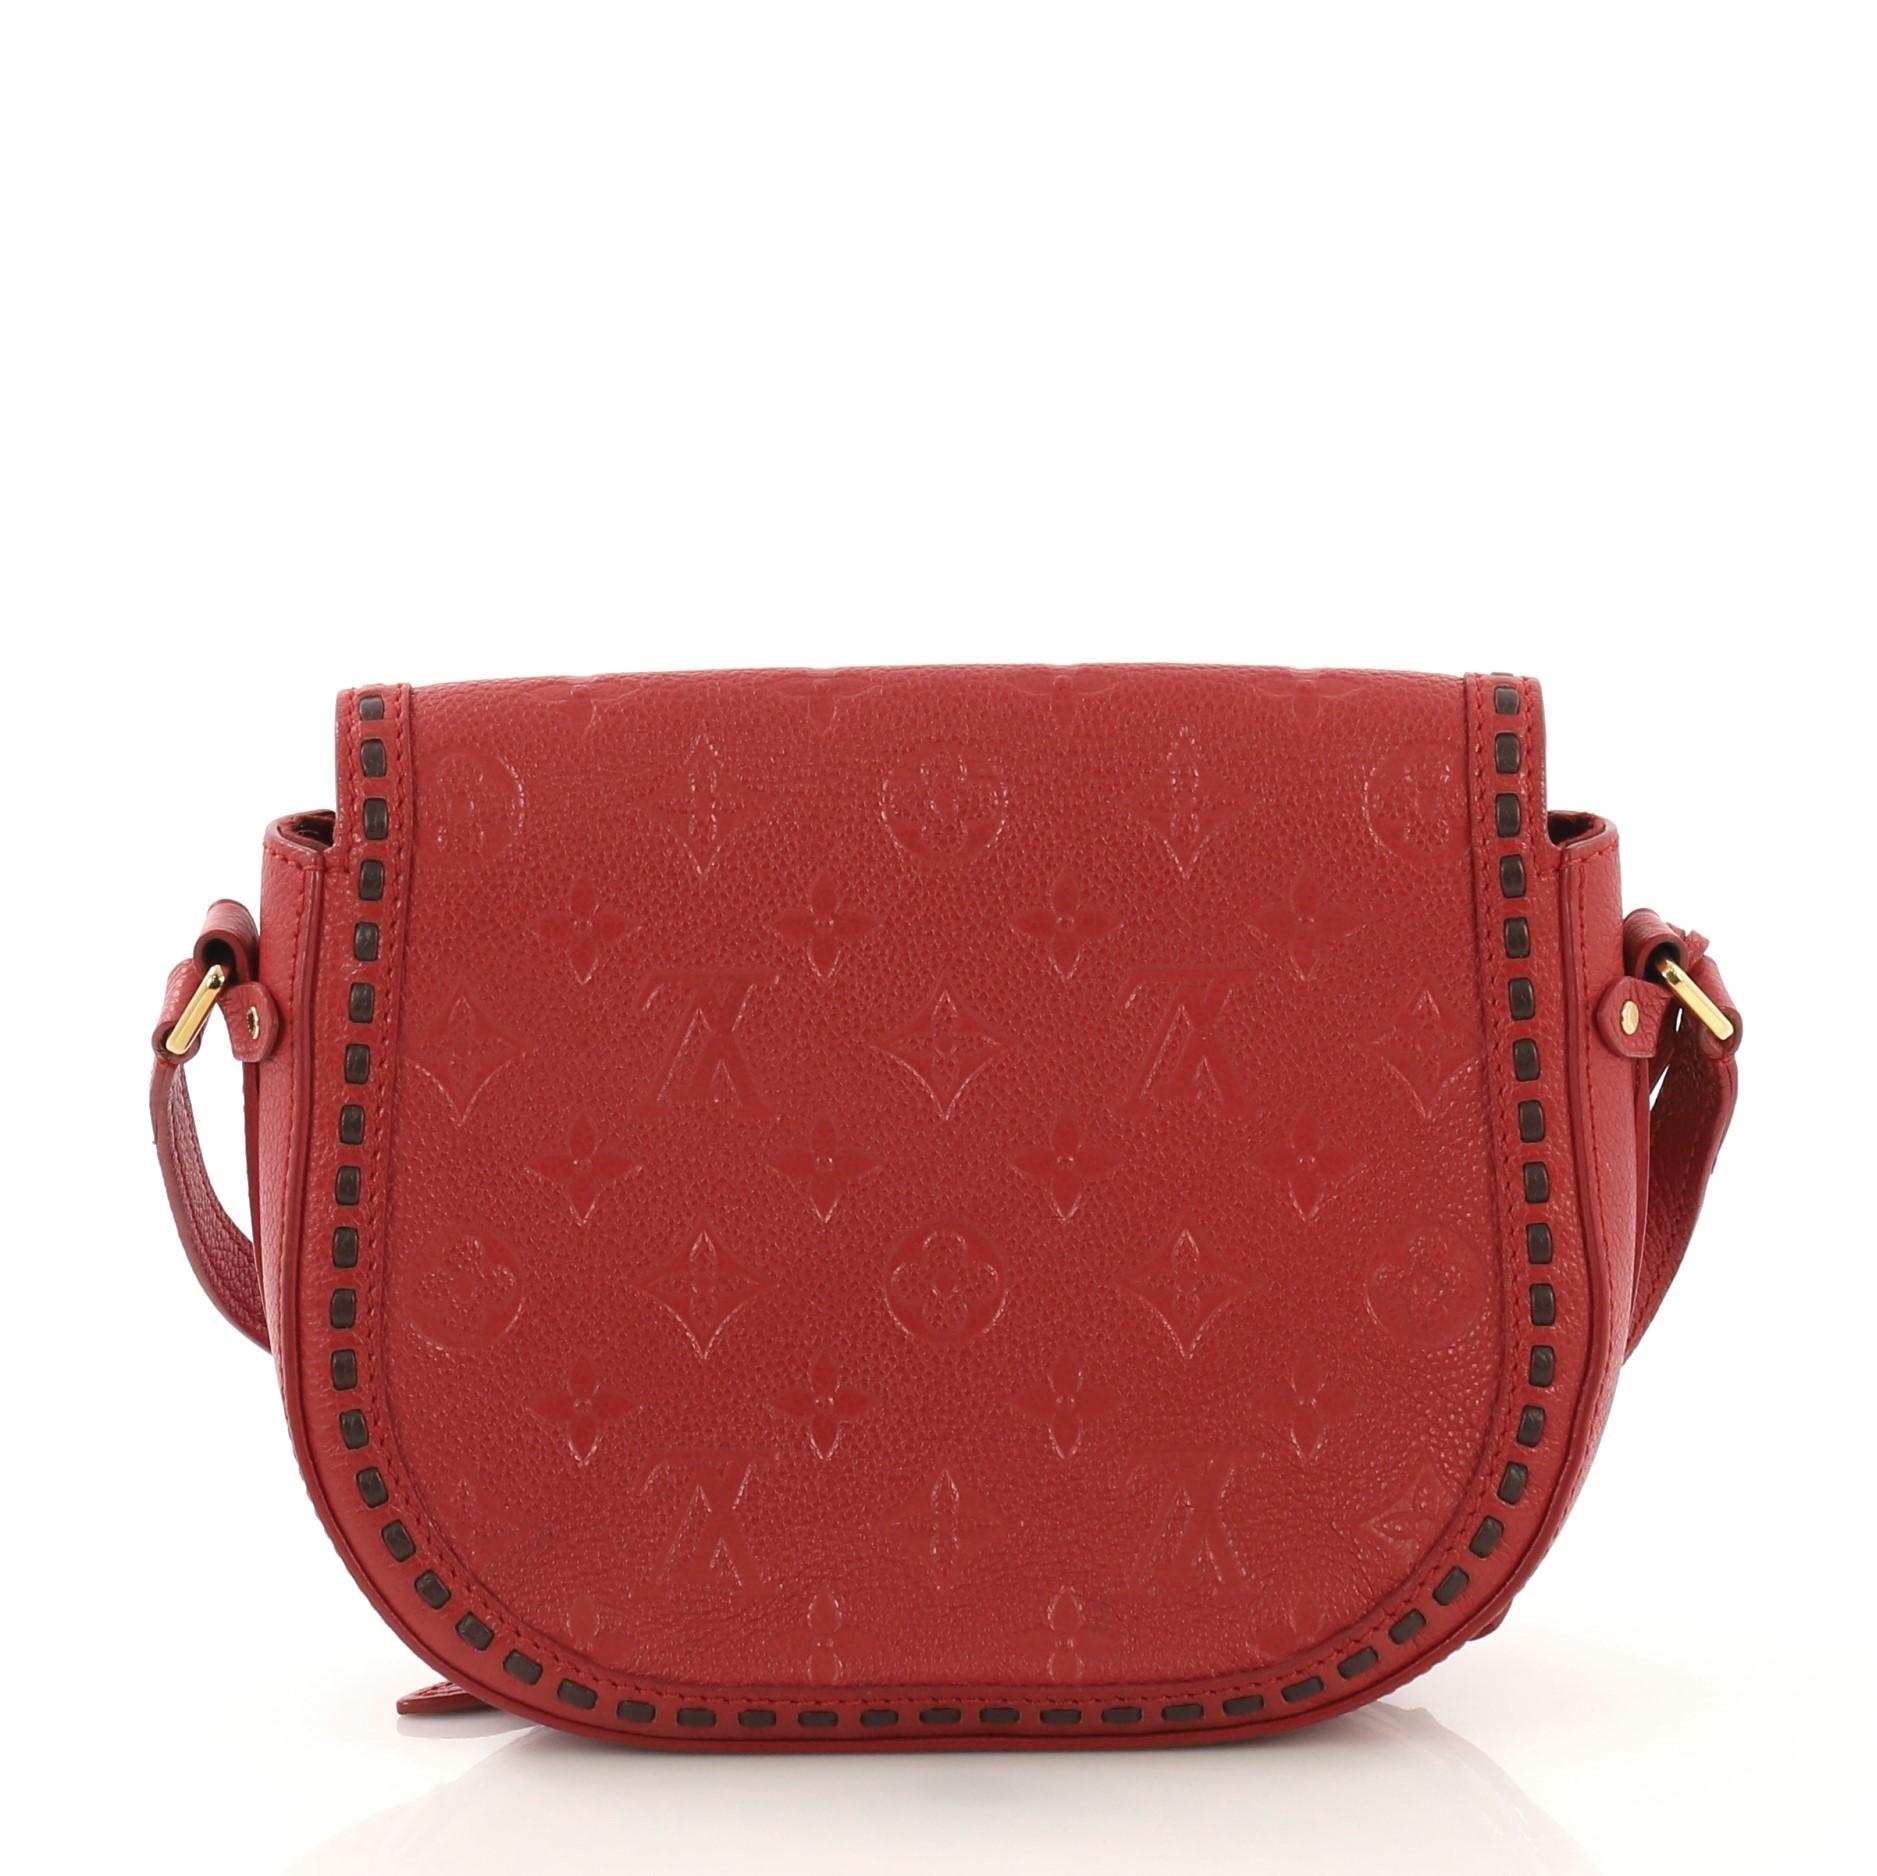 c076121ed7c89 Louis Vuitton Junot Handbag Monogram Empreinte Leather For Sale at 1stdibs